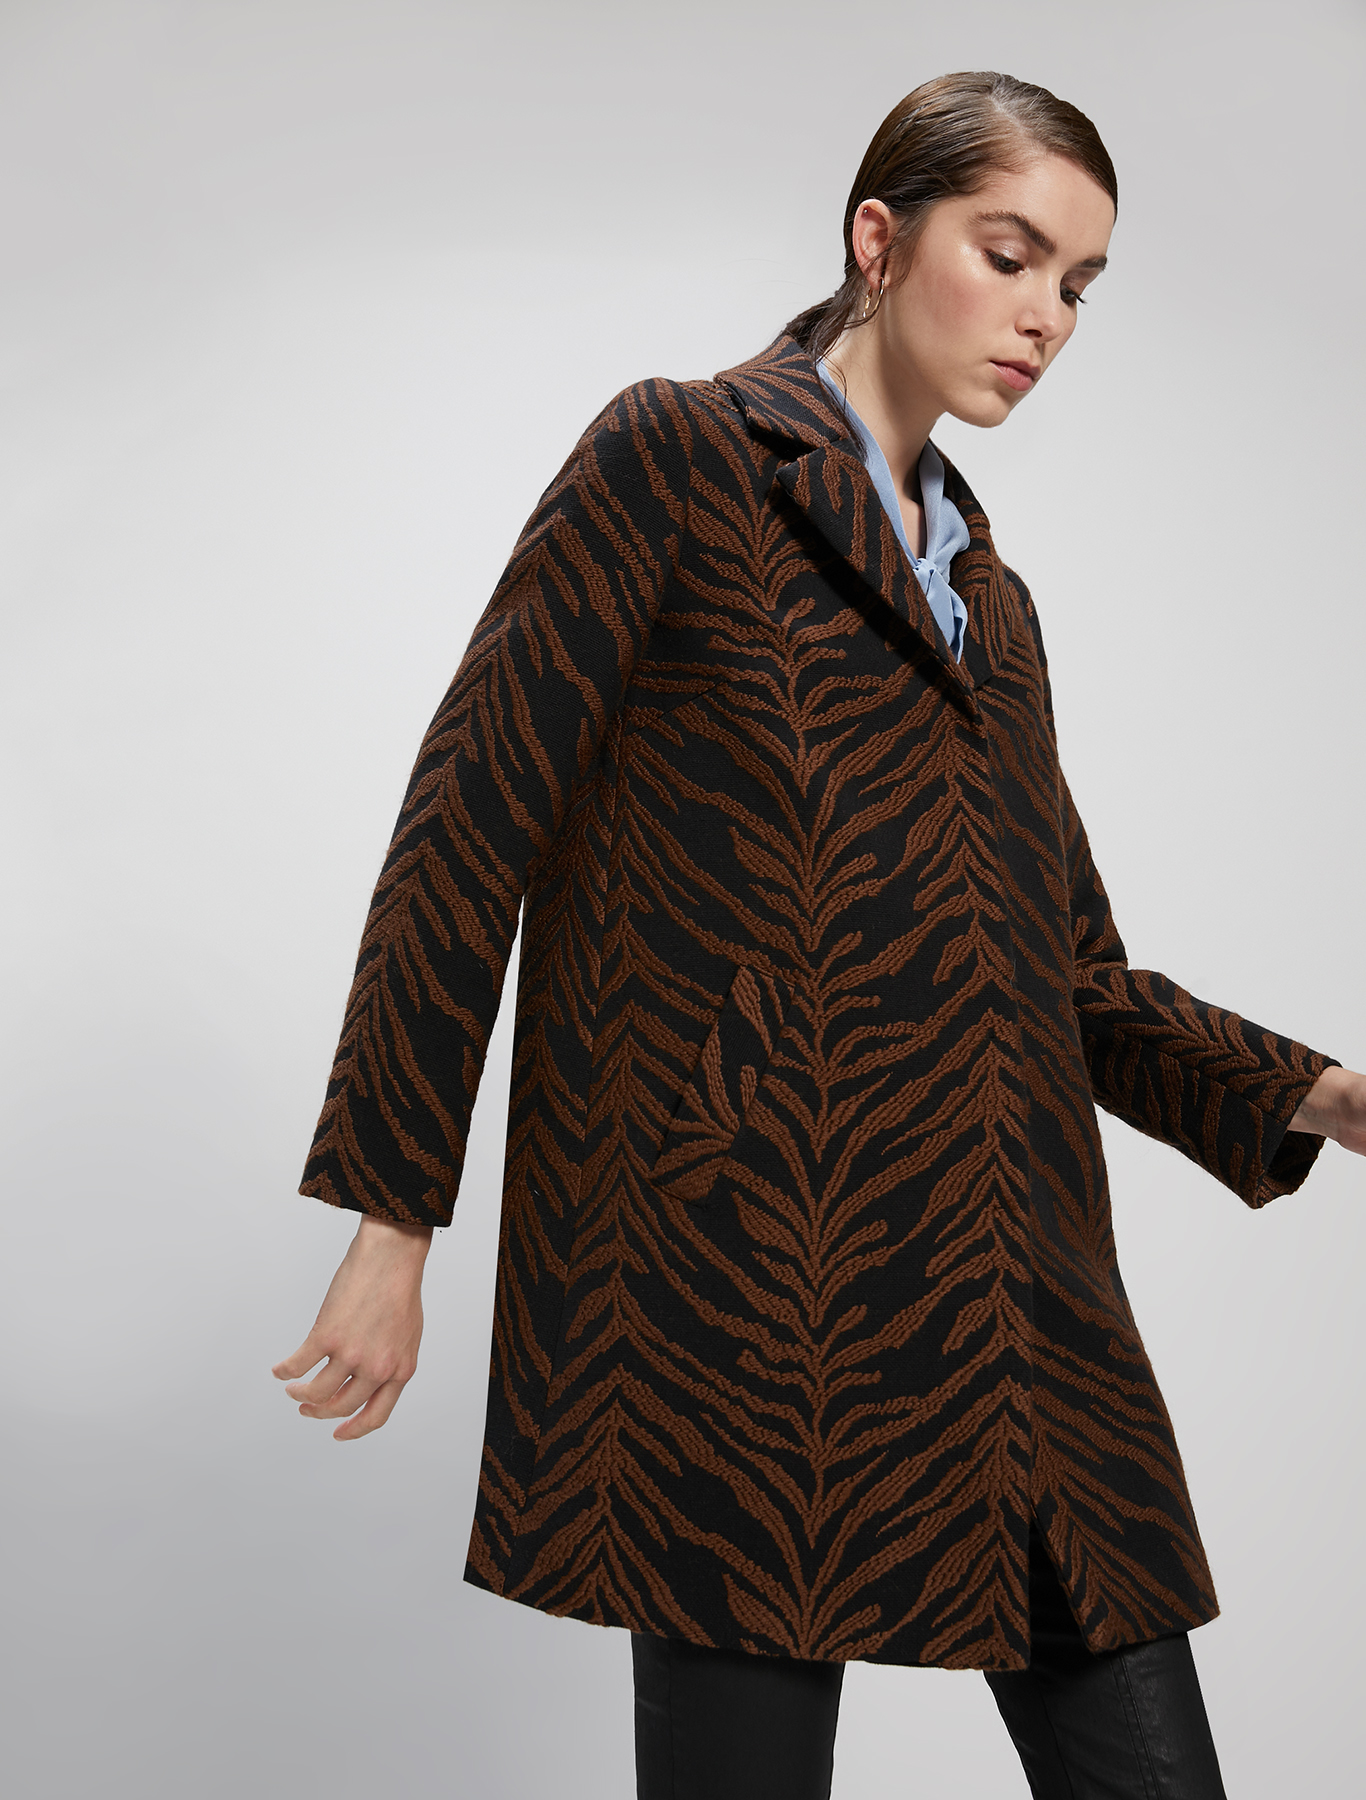 Tiger-striped jacquard coat - cocoa pattern - pennyblack